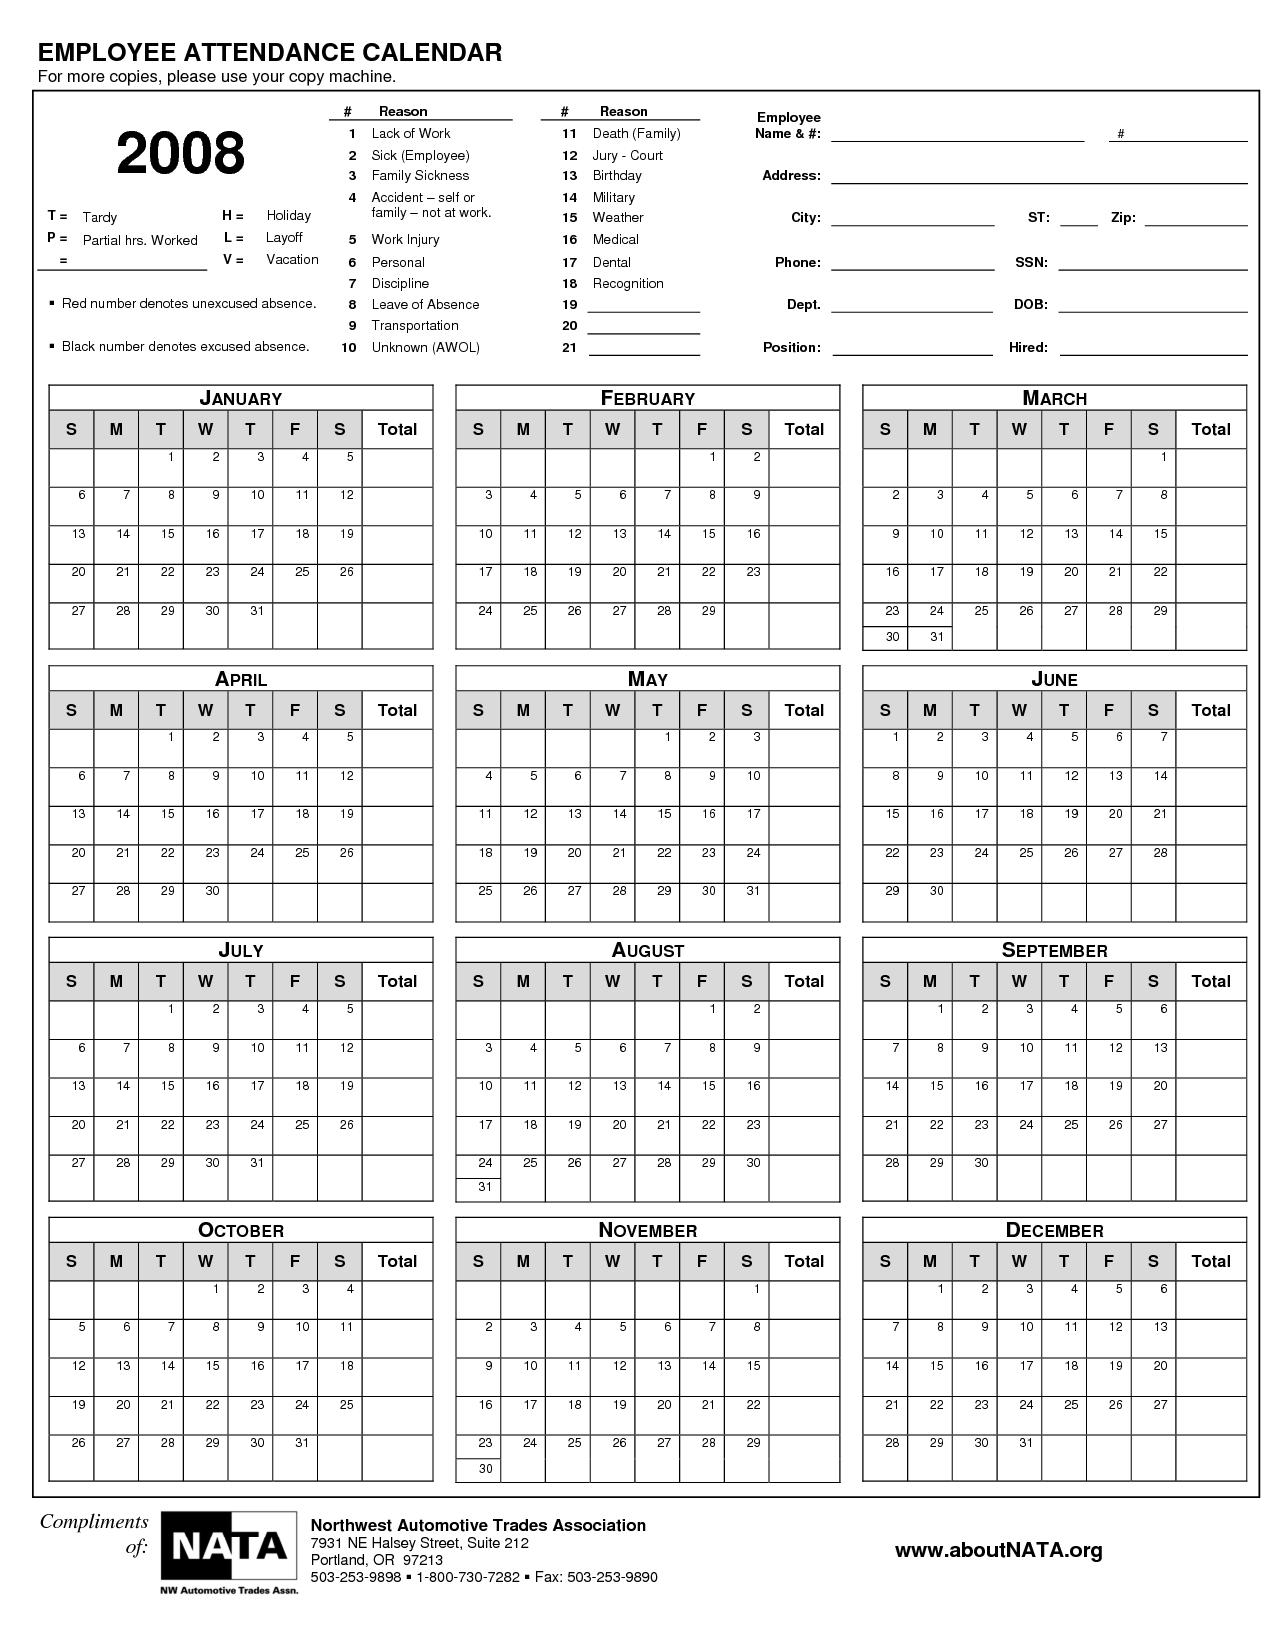 Best Photos Of Free Printable Attendance Calendar 2013 School 89uj